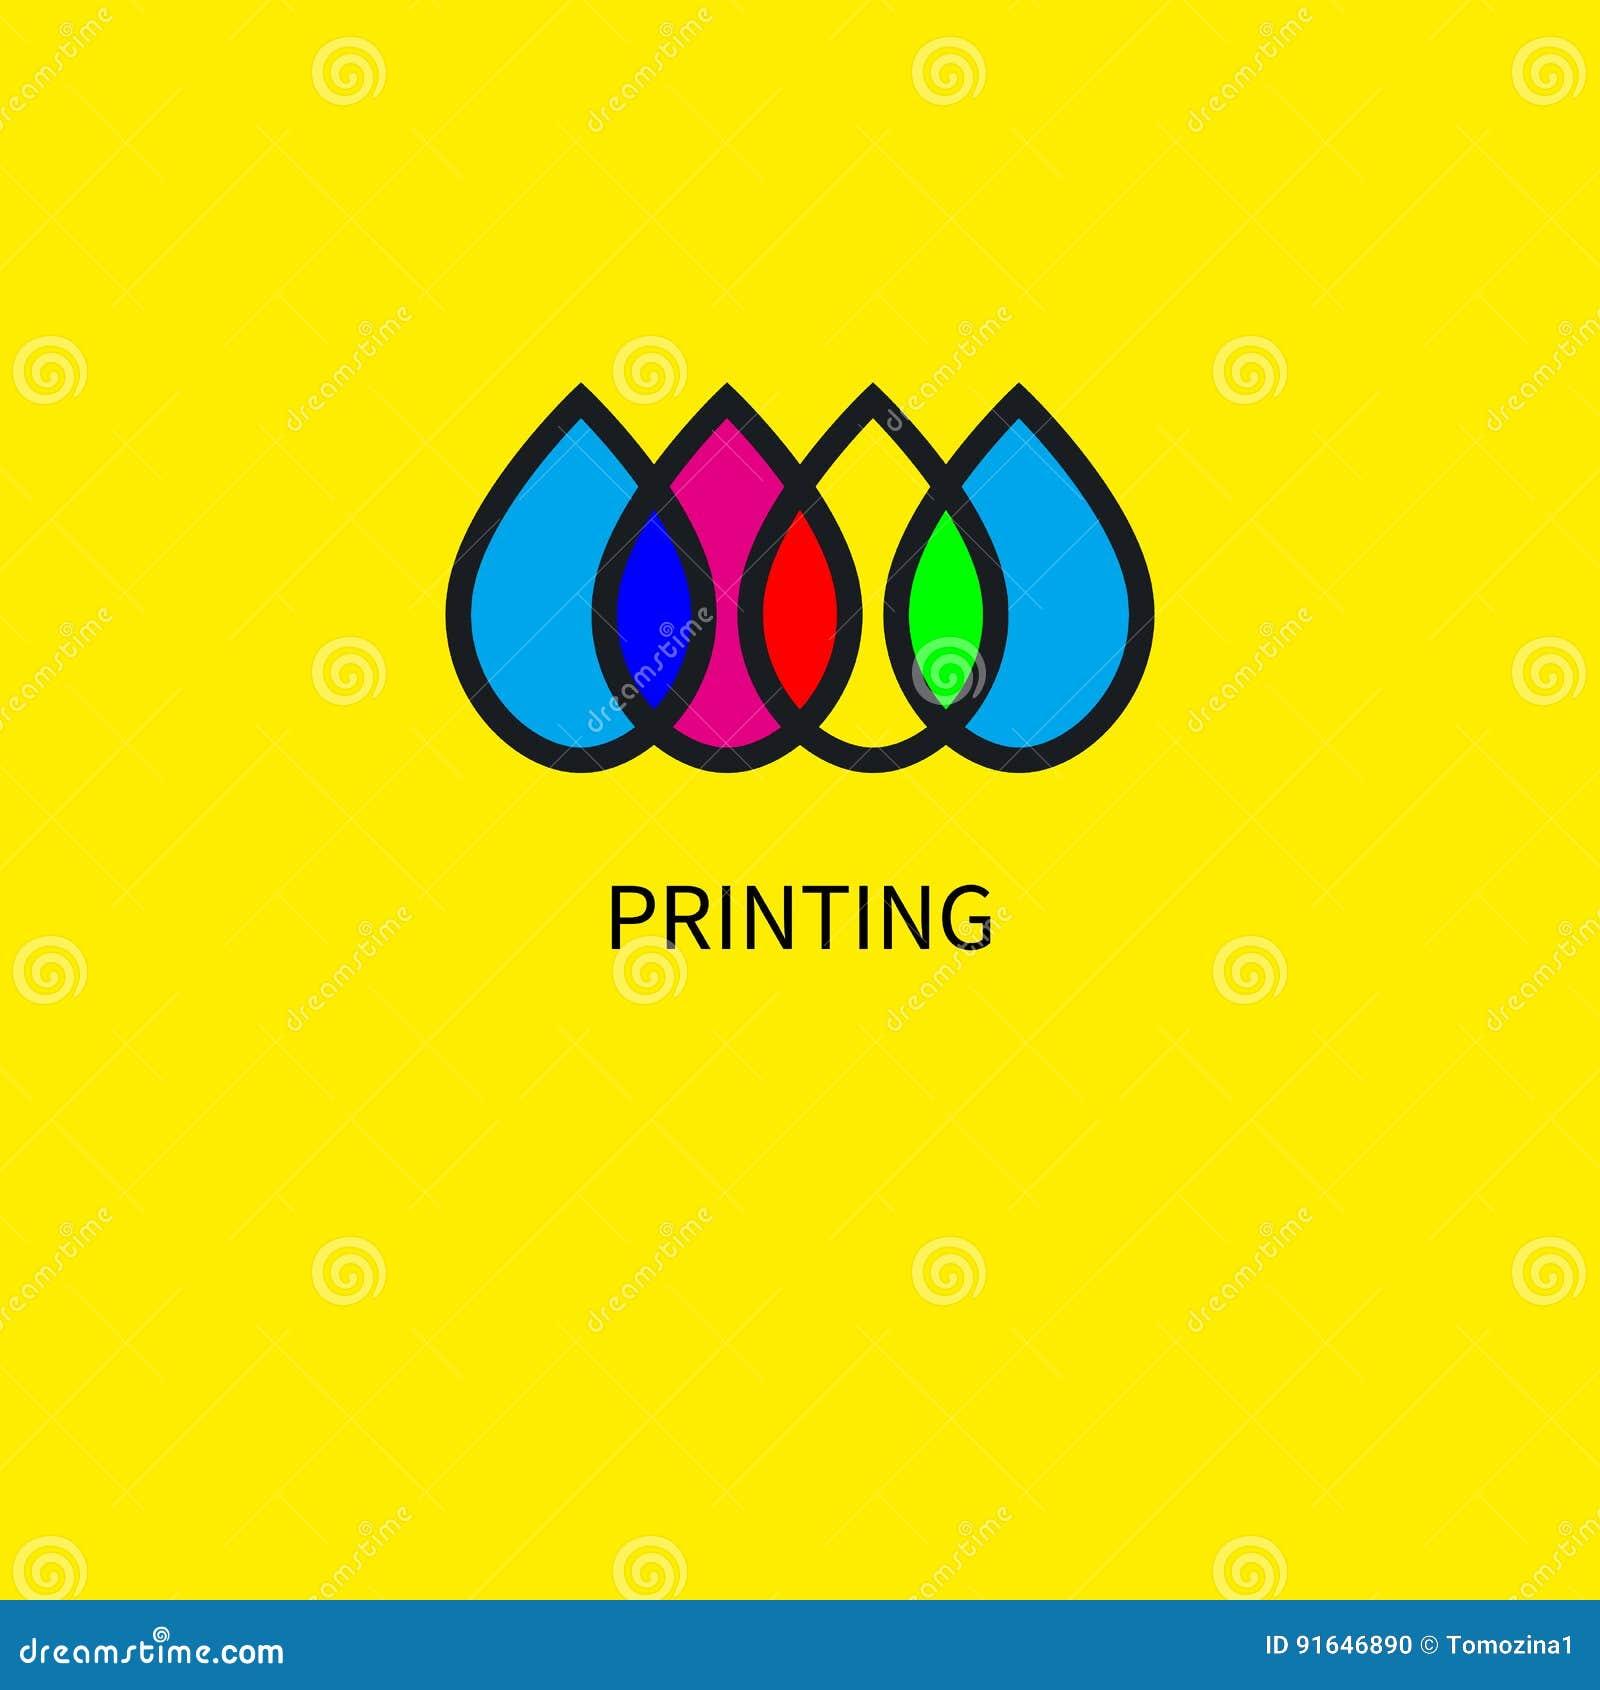 Logo printing house